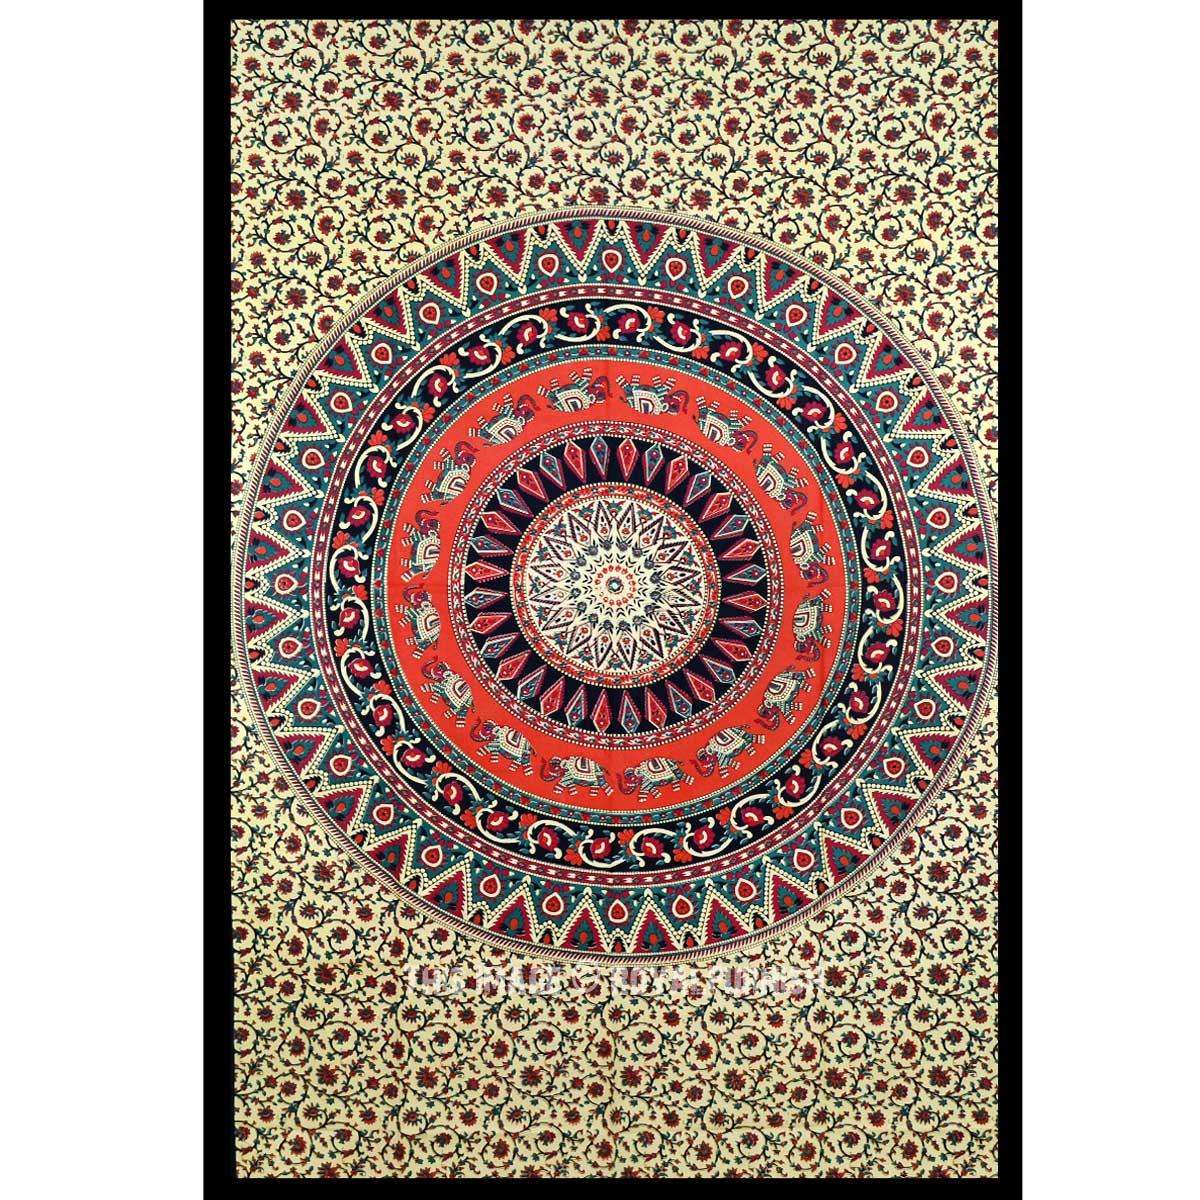 Beige Elephant Wheels Medallion Circle Tapestry Mandala